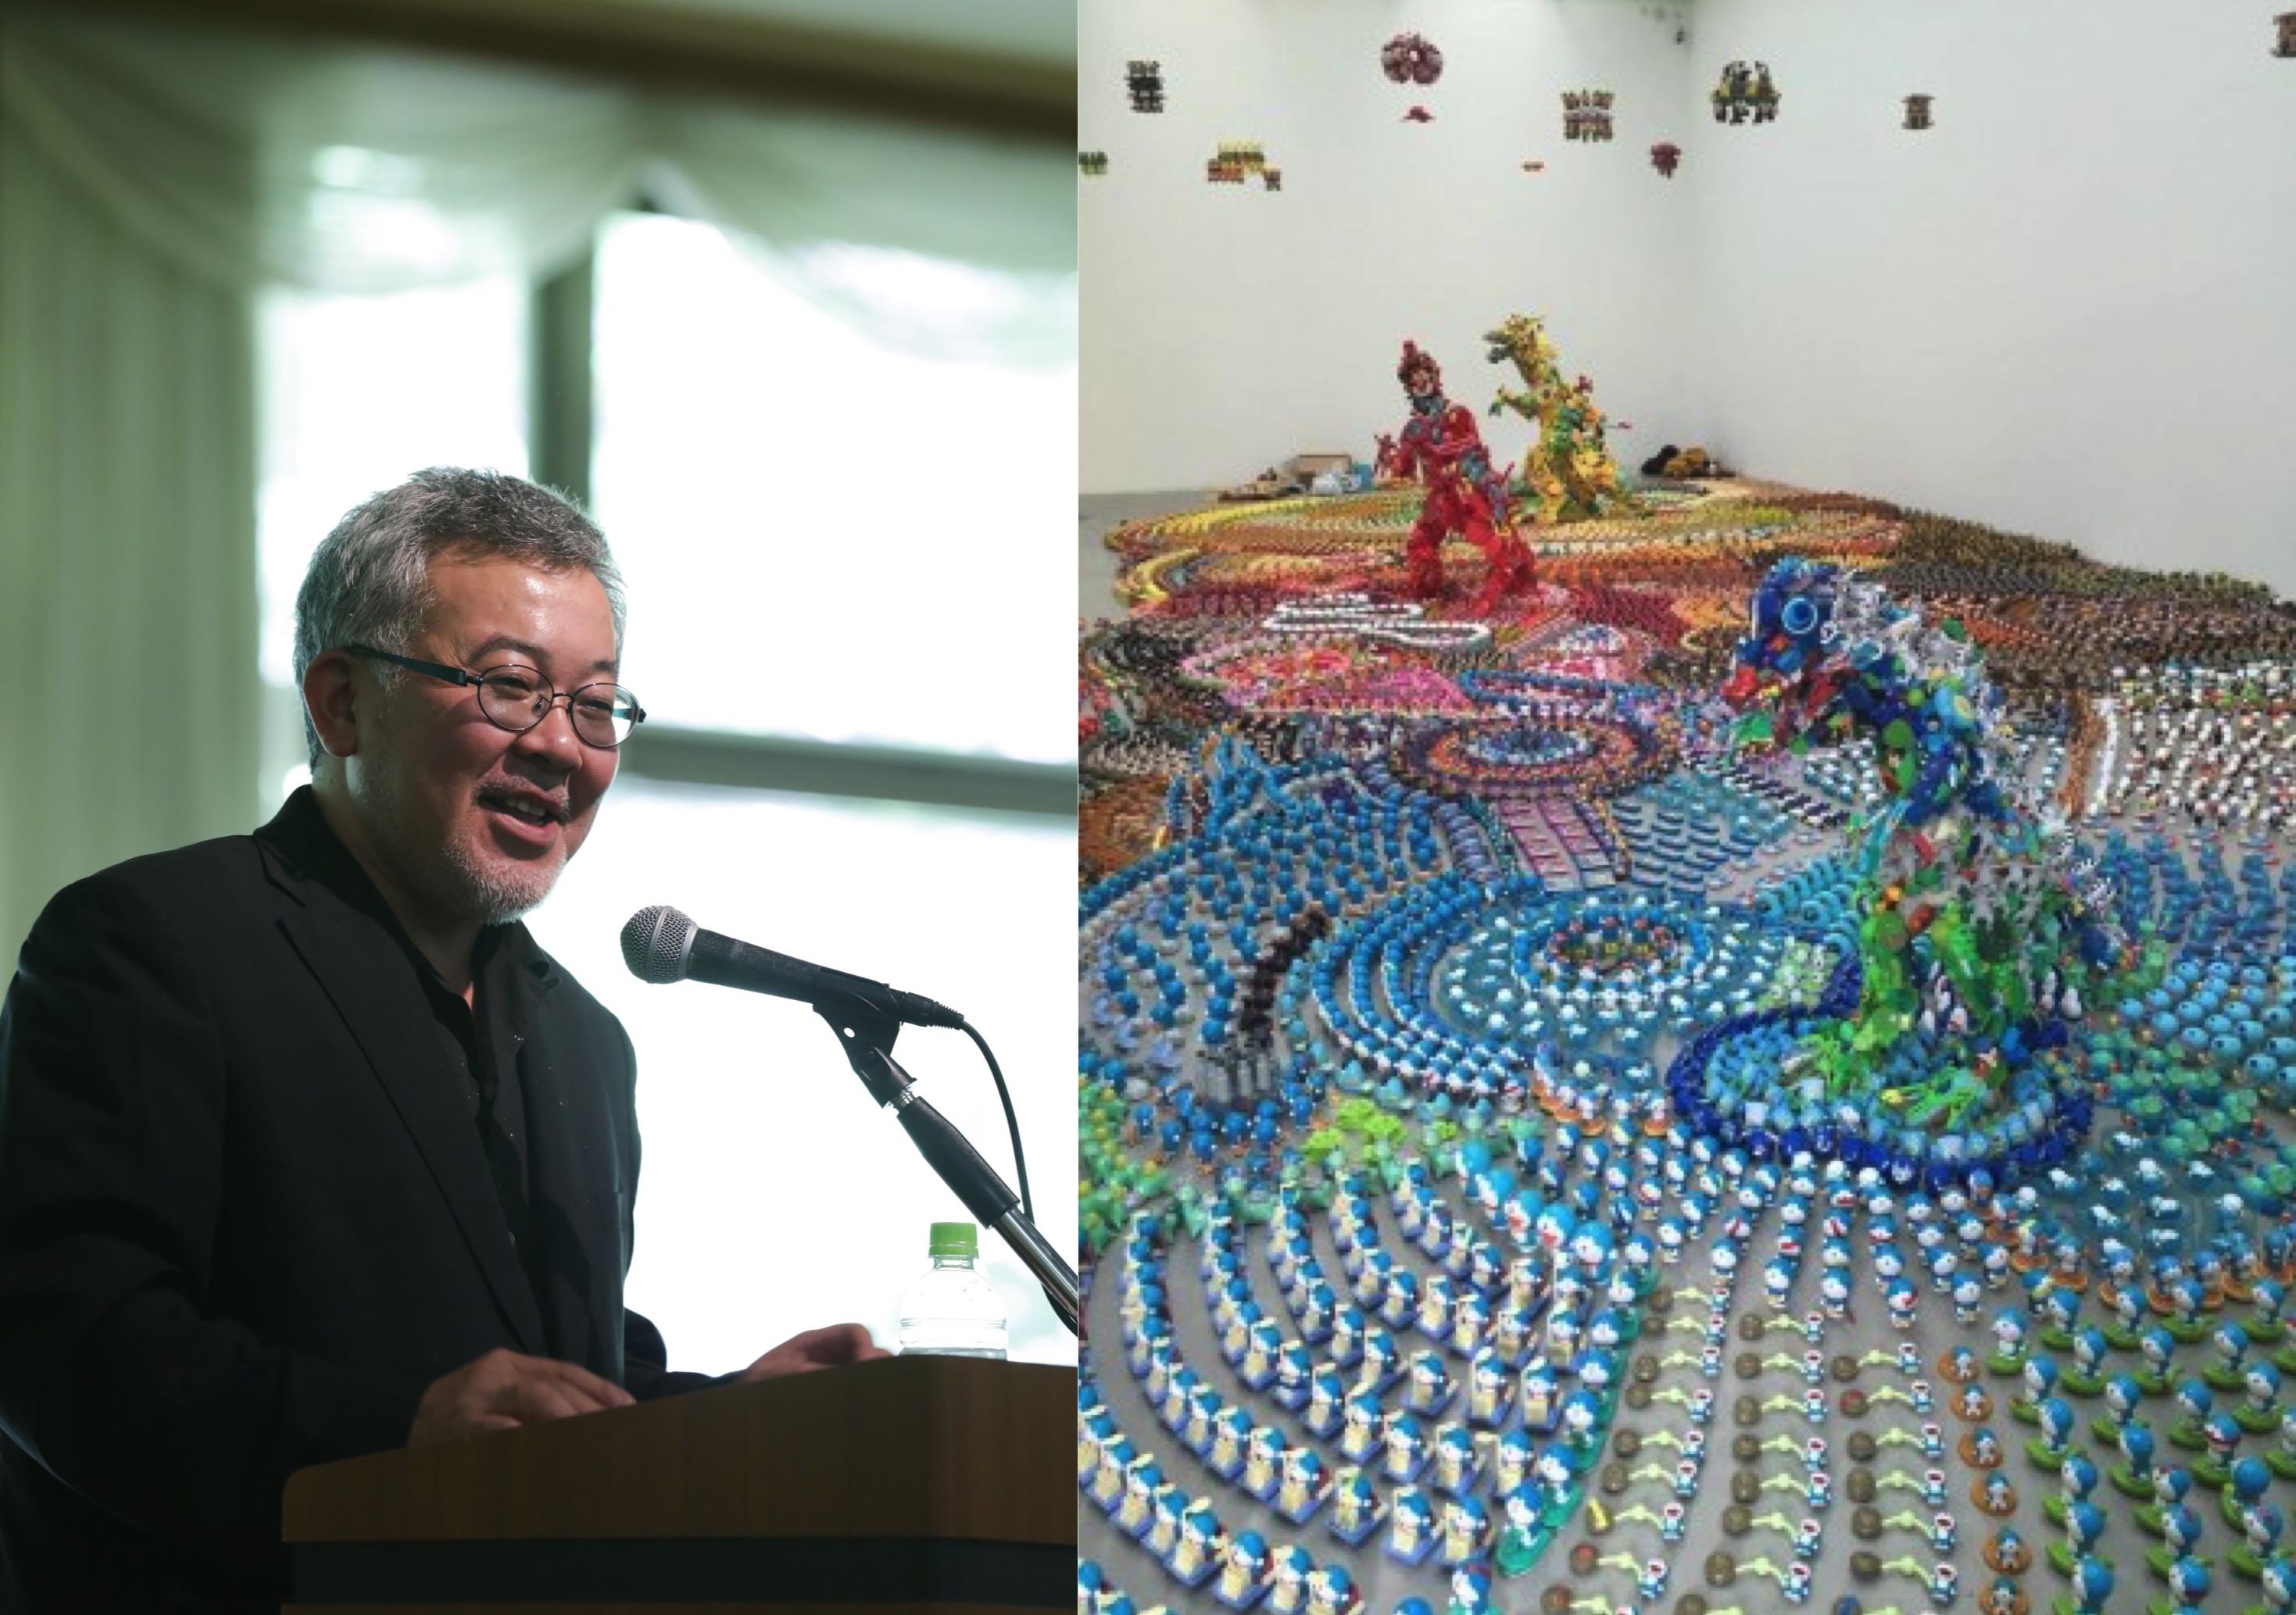 KCIC アートマネジメント ラボ 成果報告会「やわらかい社会のために」 講師:藤浩志(美術家 / 十和田市現代美術館館長)